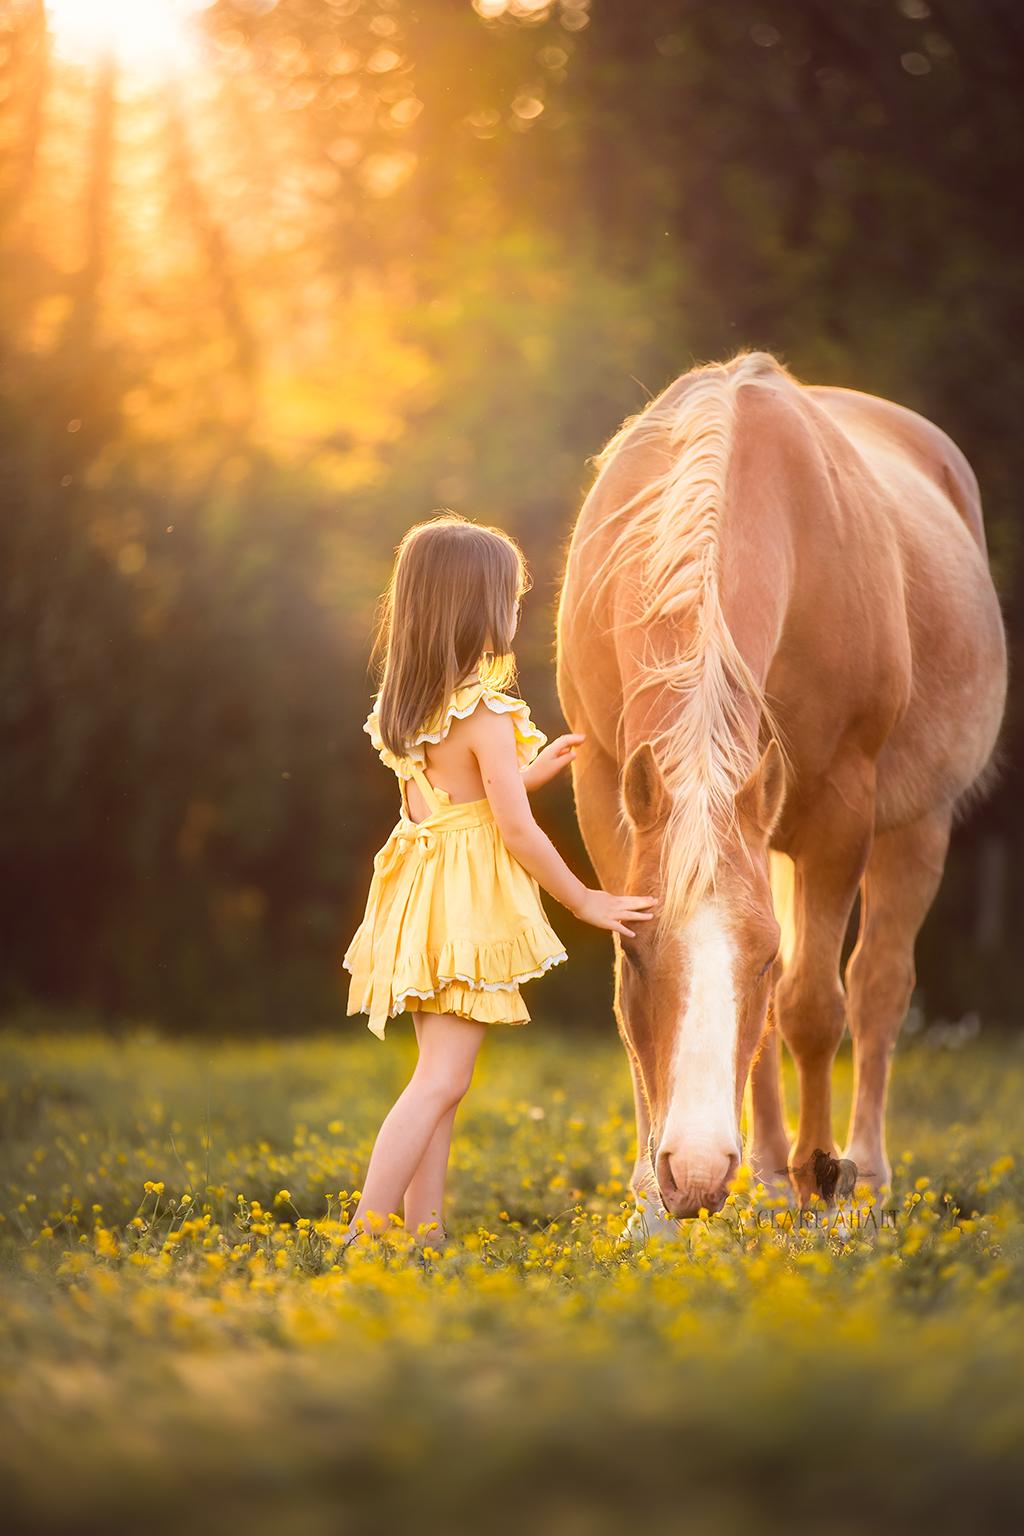 Znalezione obrazy dla zapytania horse and child